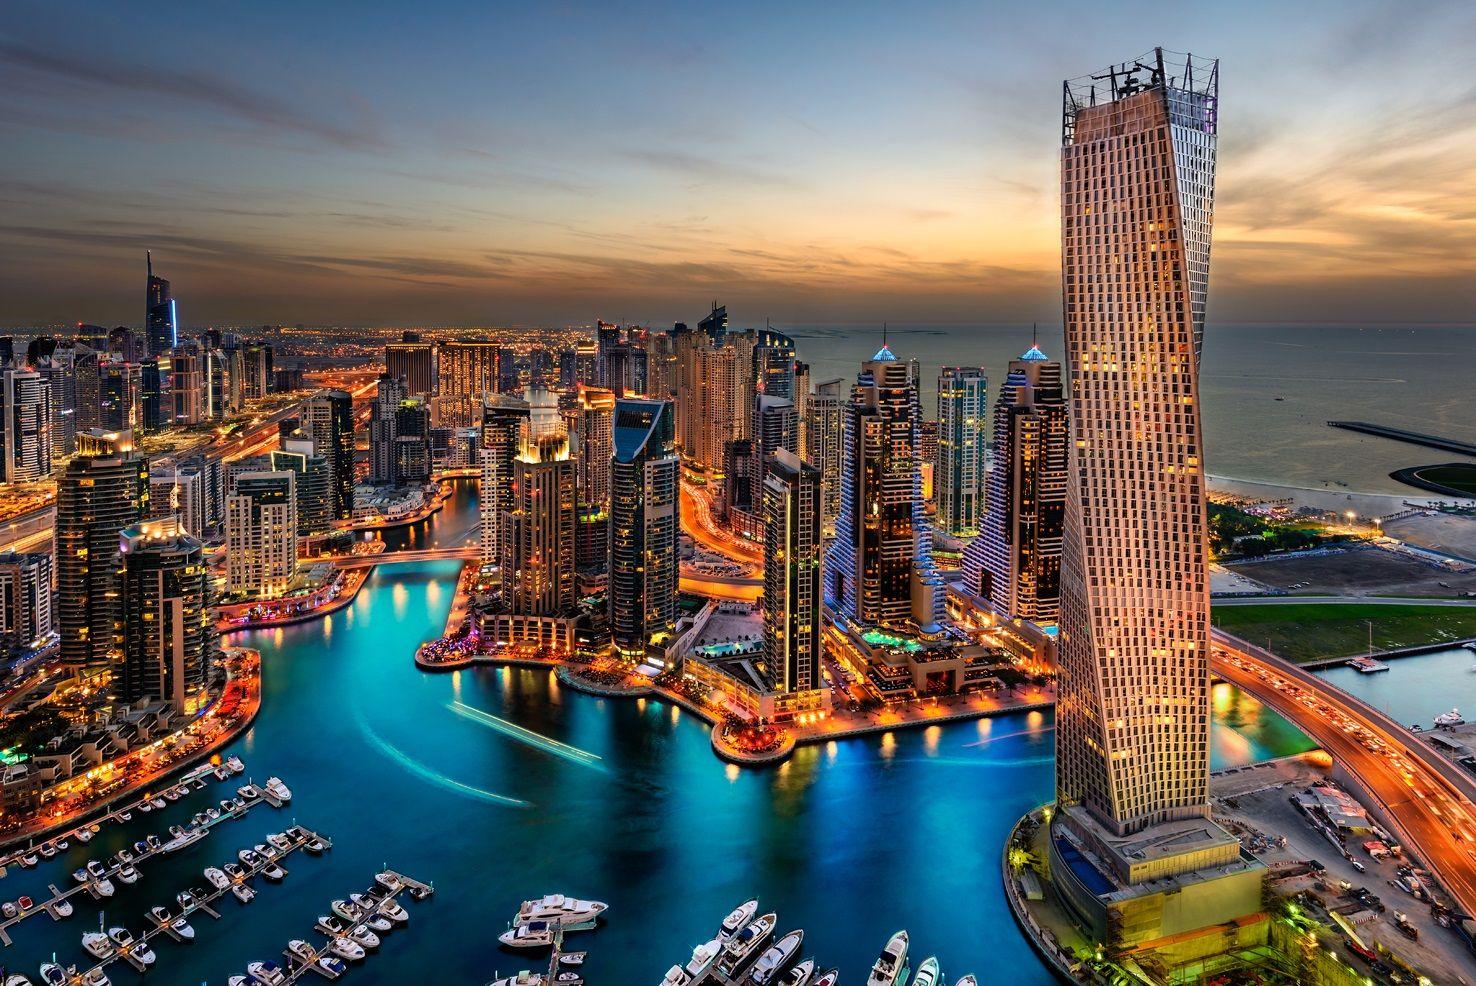 Dubai-excentricidades-13.jpg 1476×986 pikseli